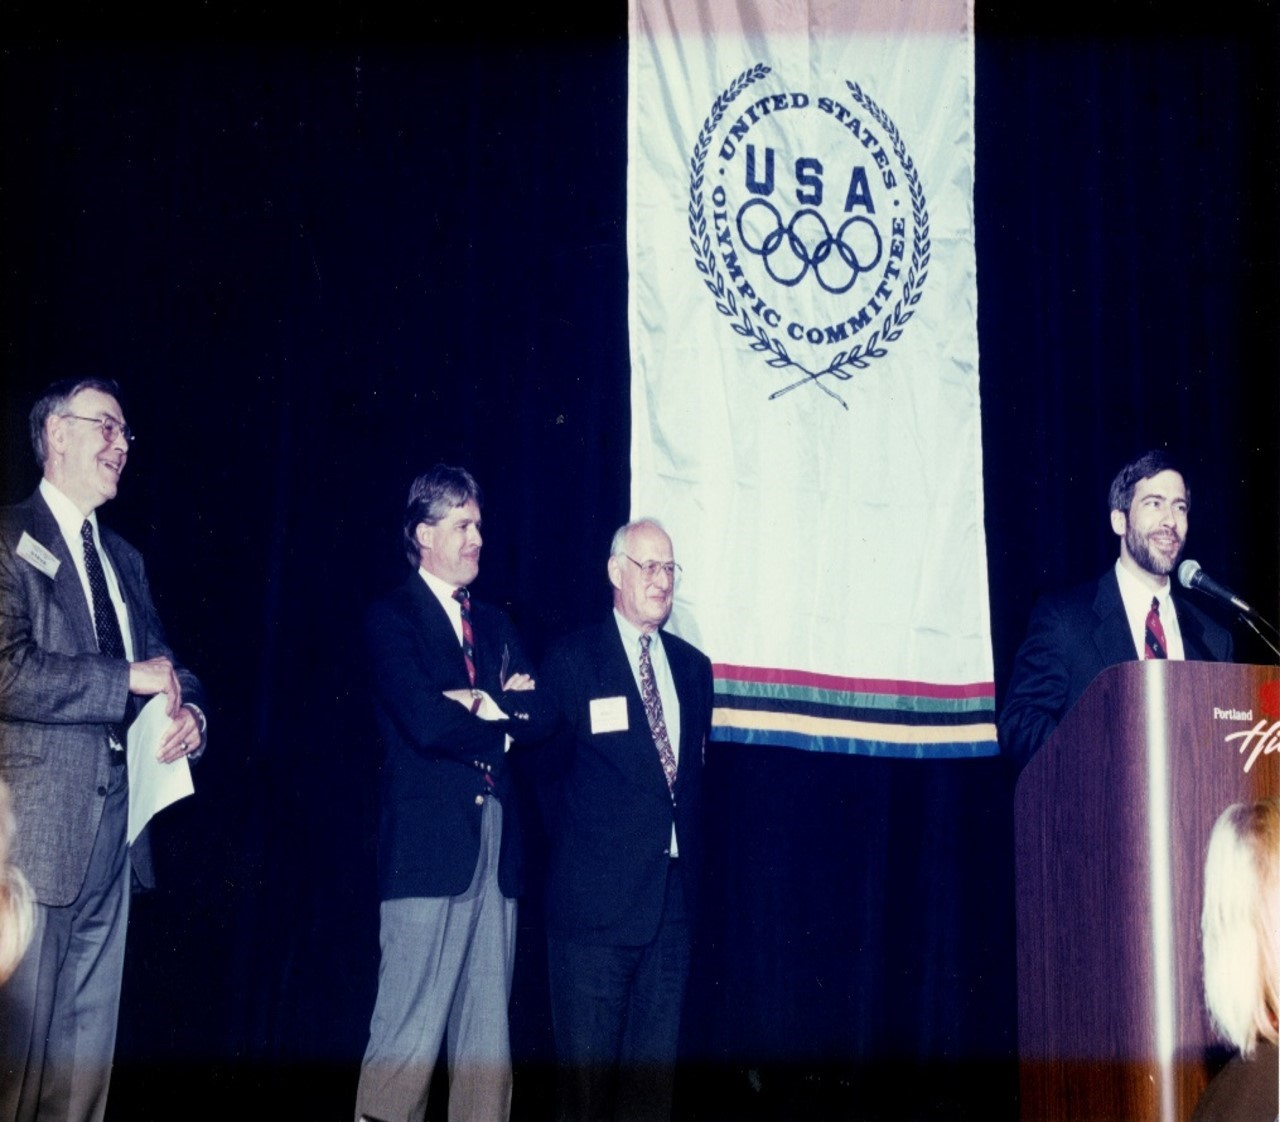 Bob Latham United States Olympic Committee